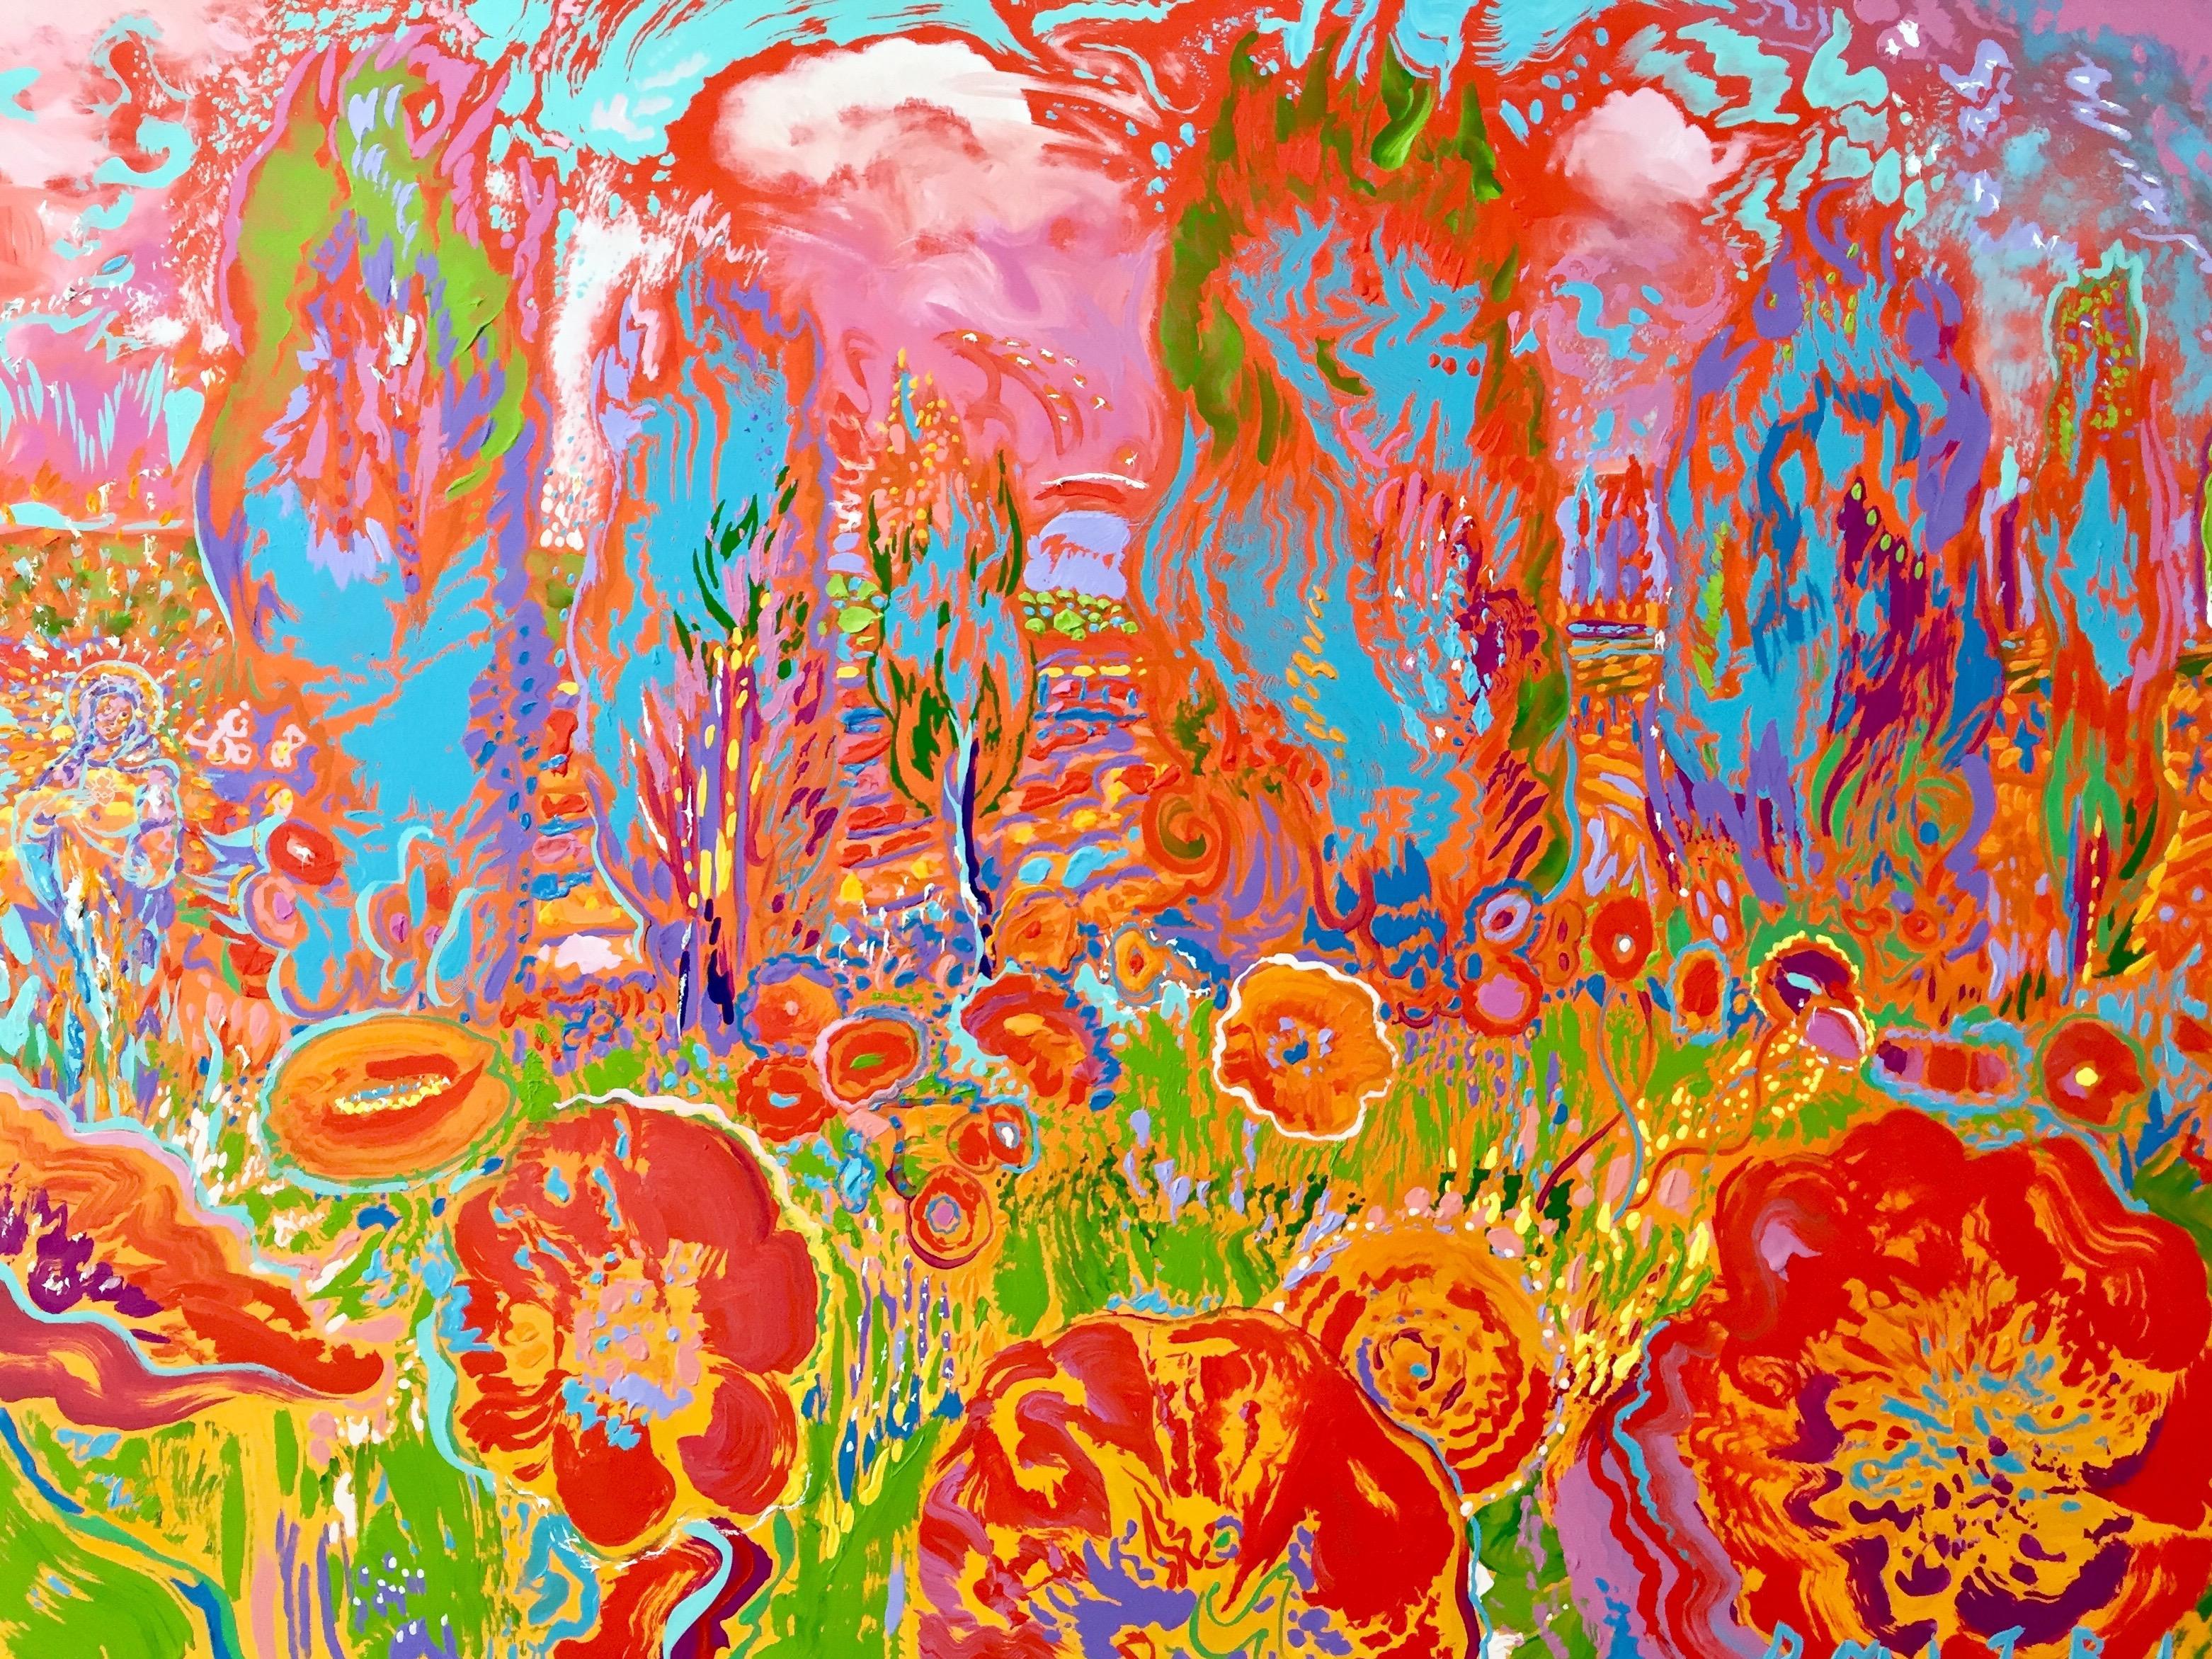 Visione Mistica, original 36x48 contemporary landscape